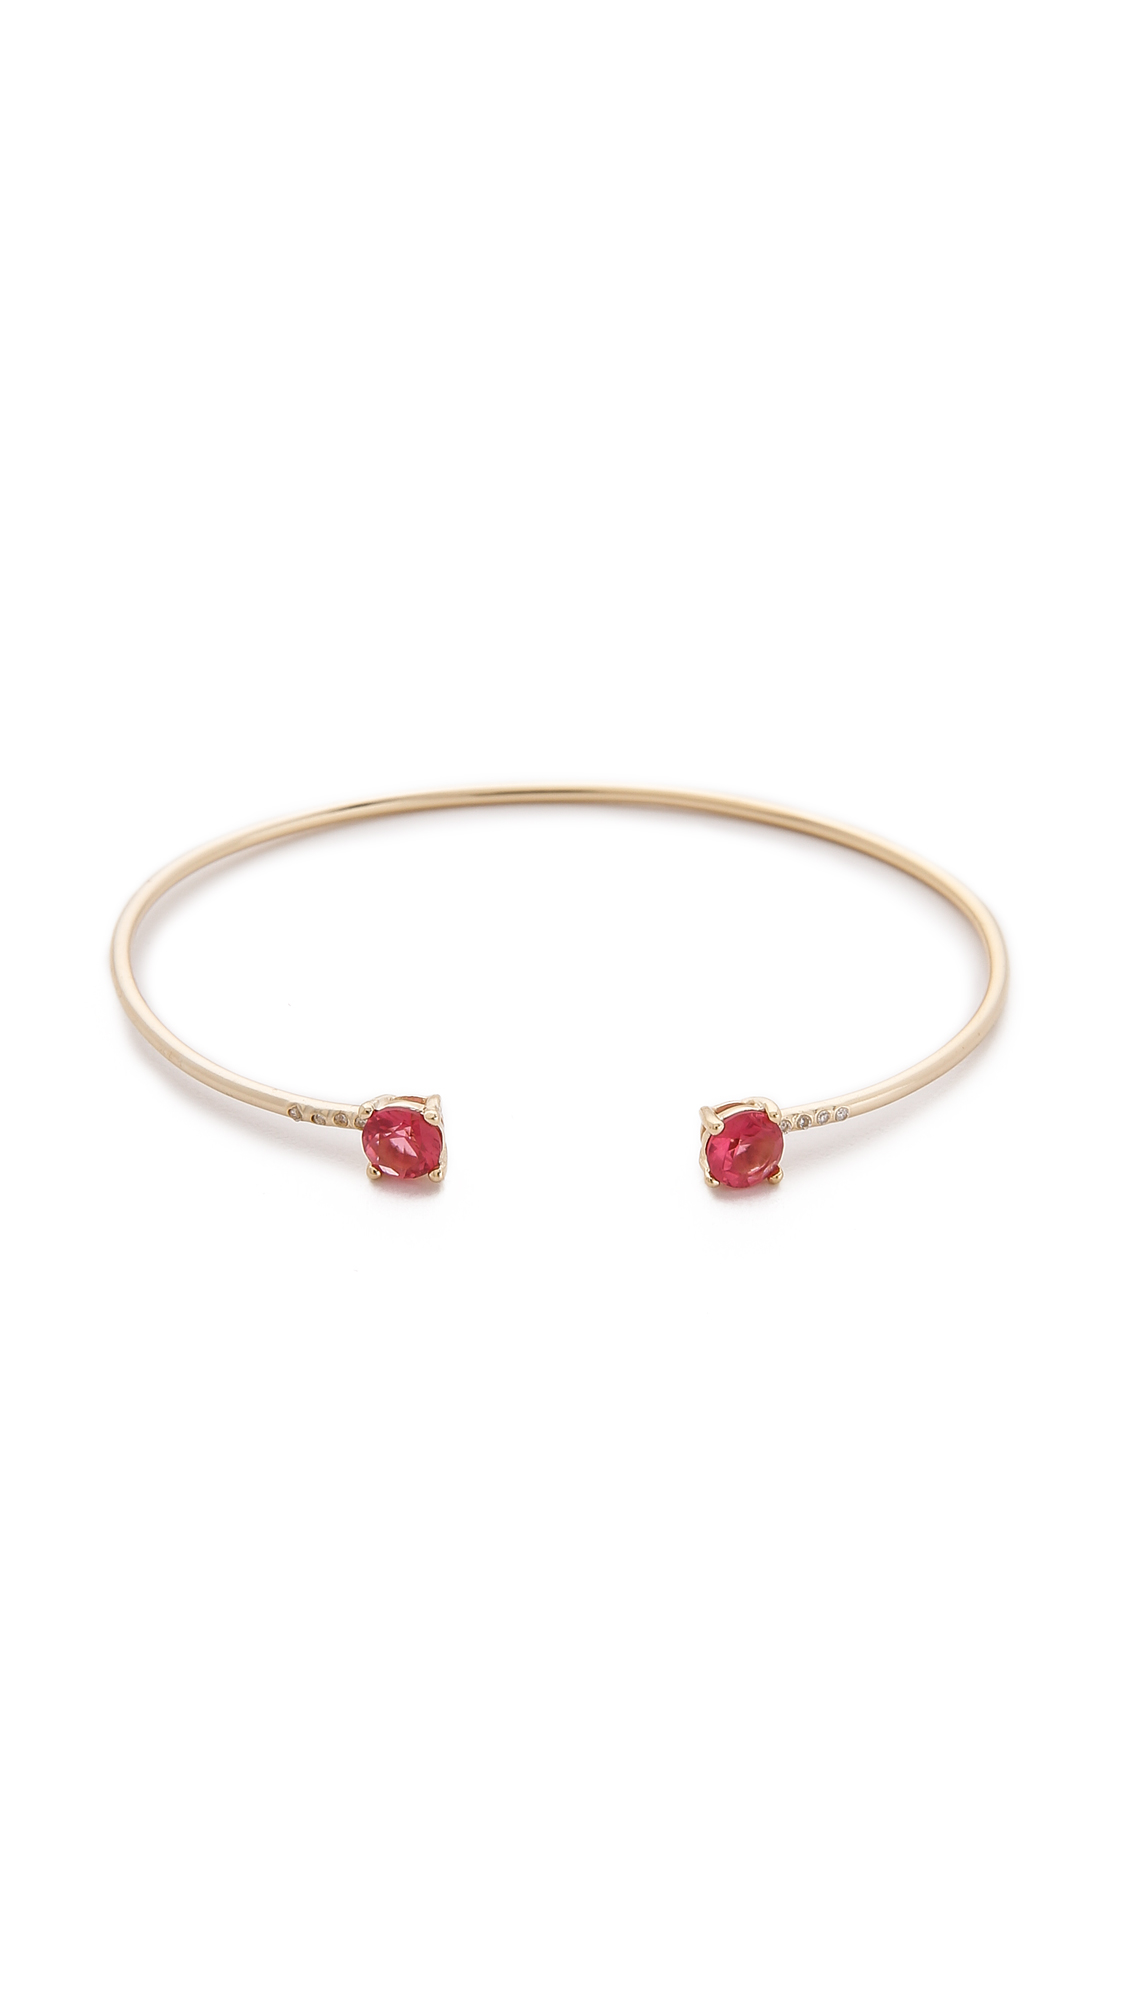 Shashi Ivy Cuff Bracelet AvRN6joa